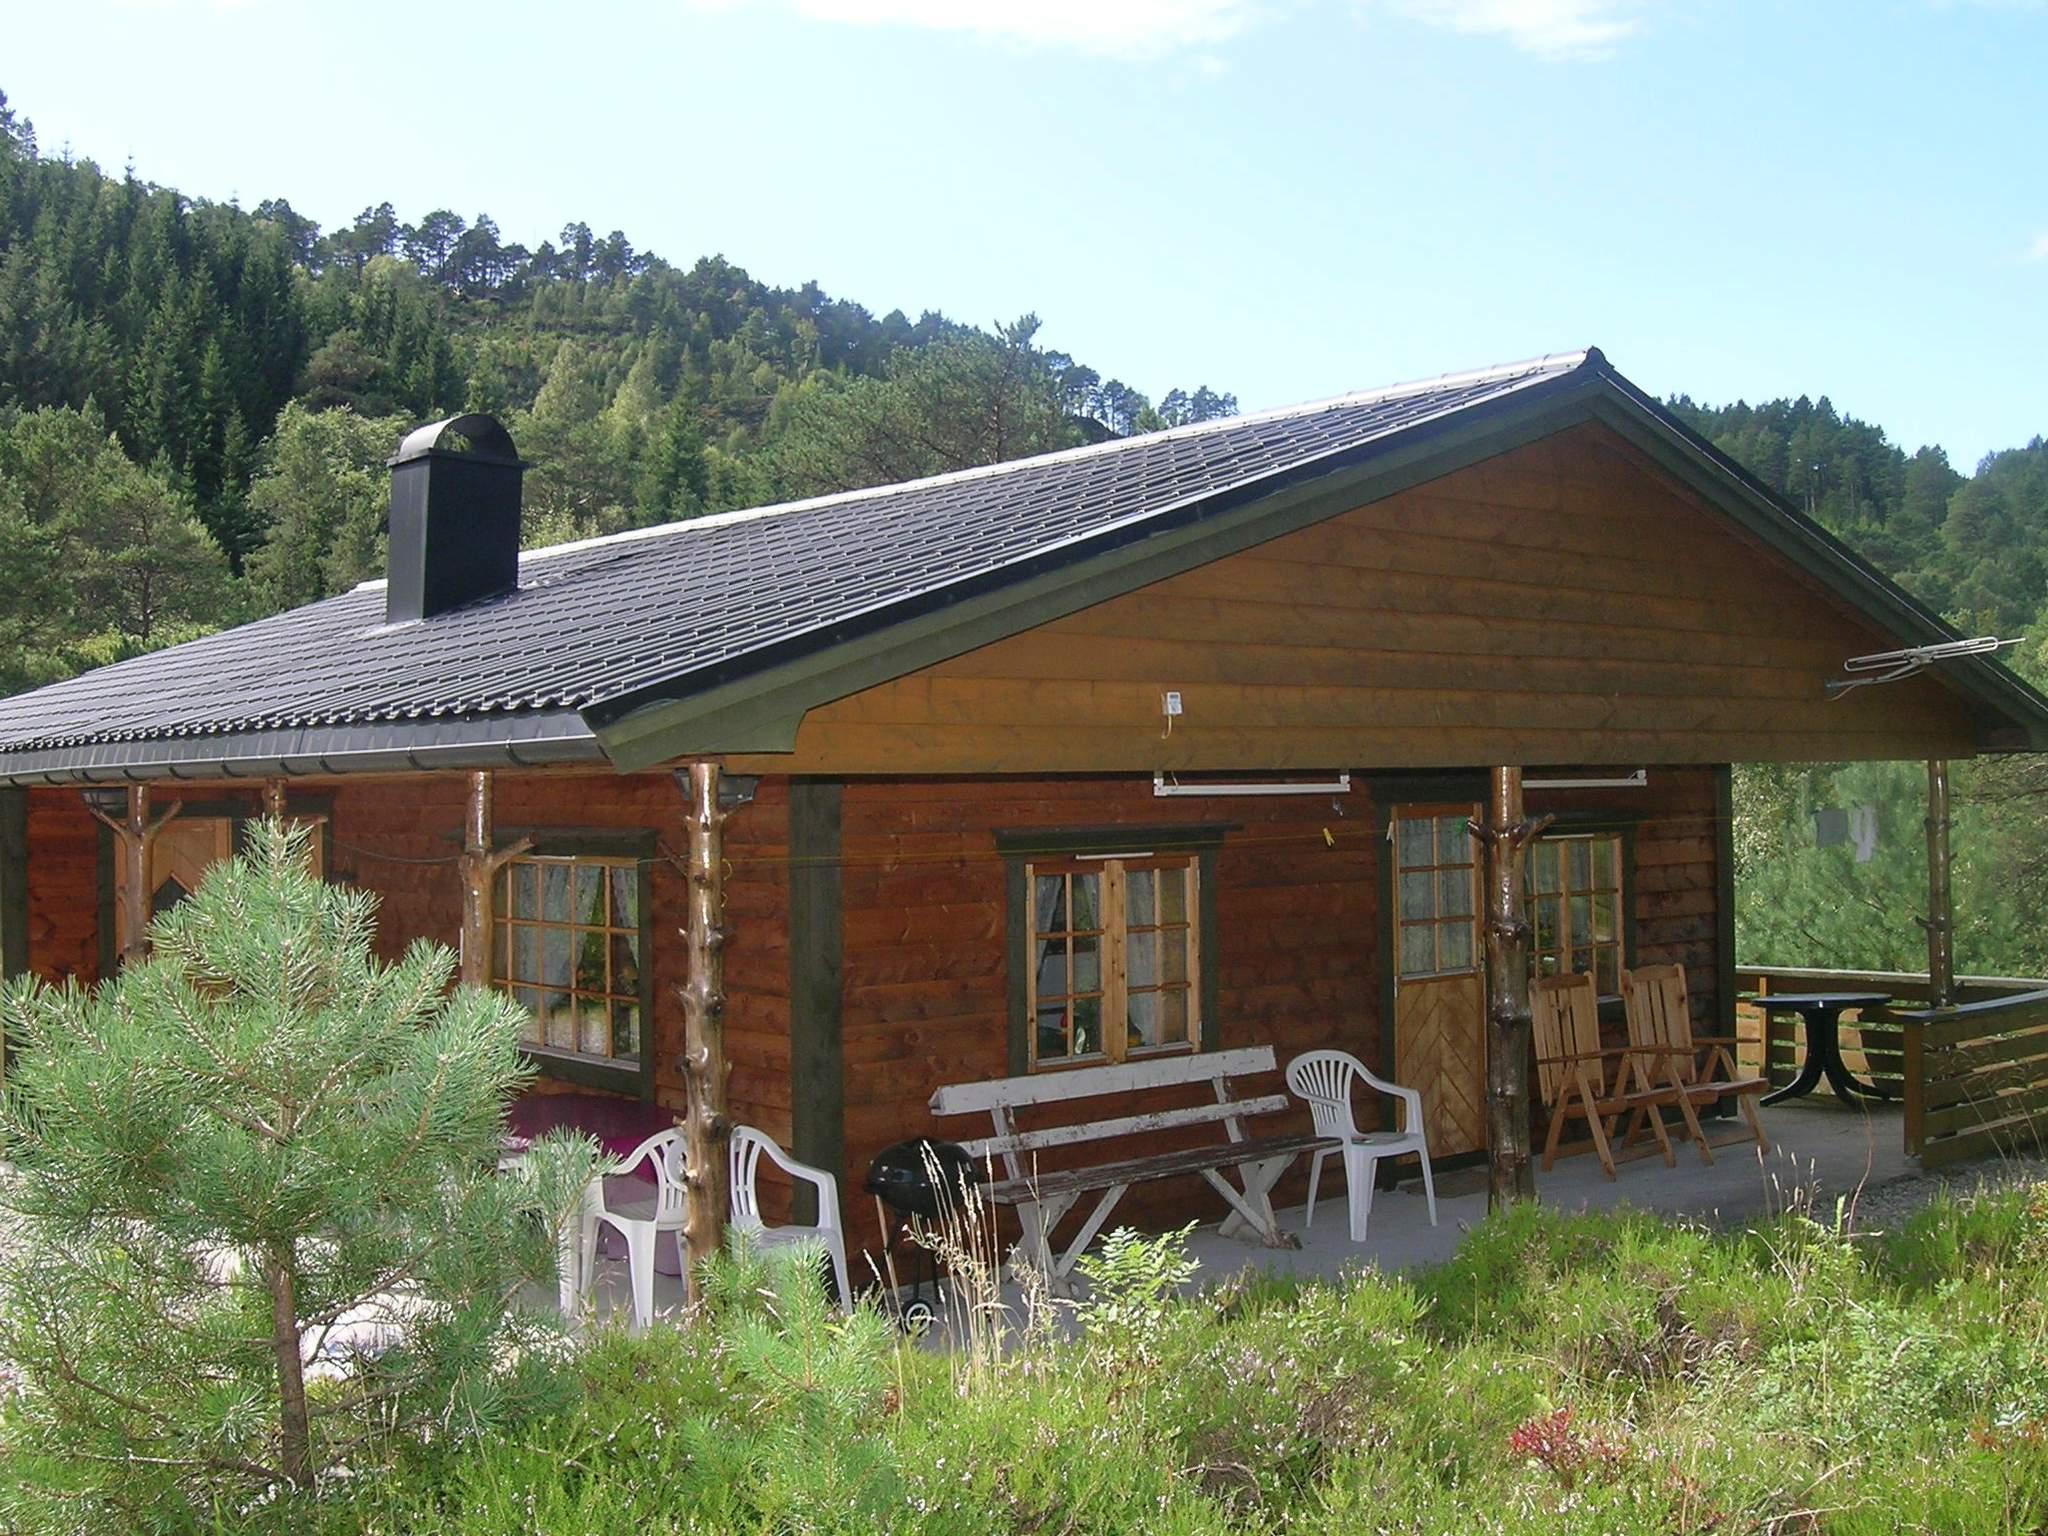 Ferienhaus Helle (82342), Naustdal, Sognefjord - Nordfjord, Westnorwegen, Norwegen, Bild 13